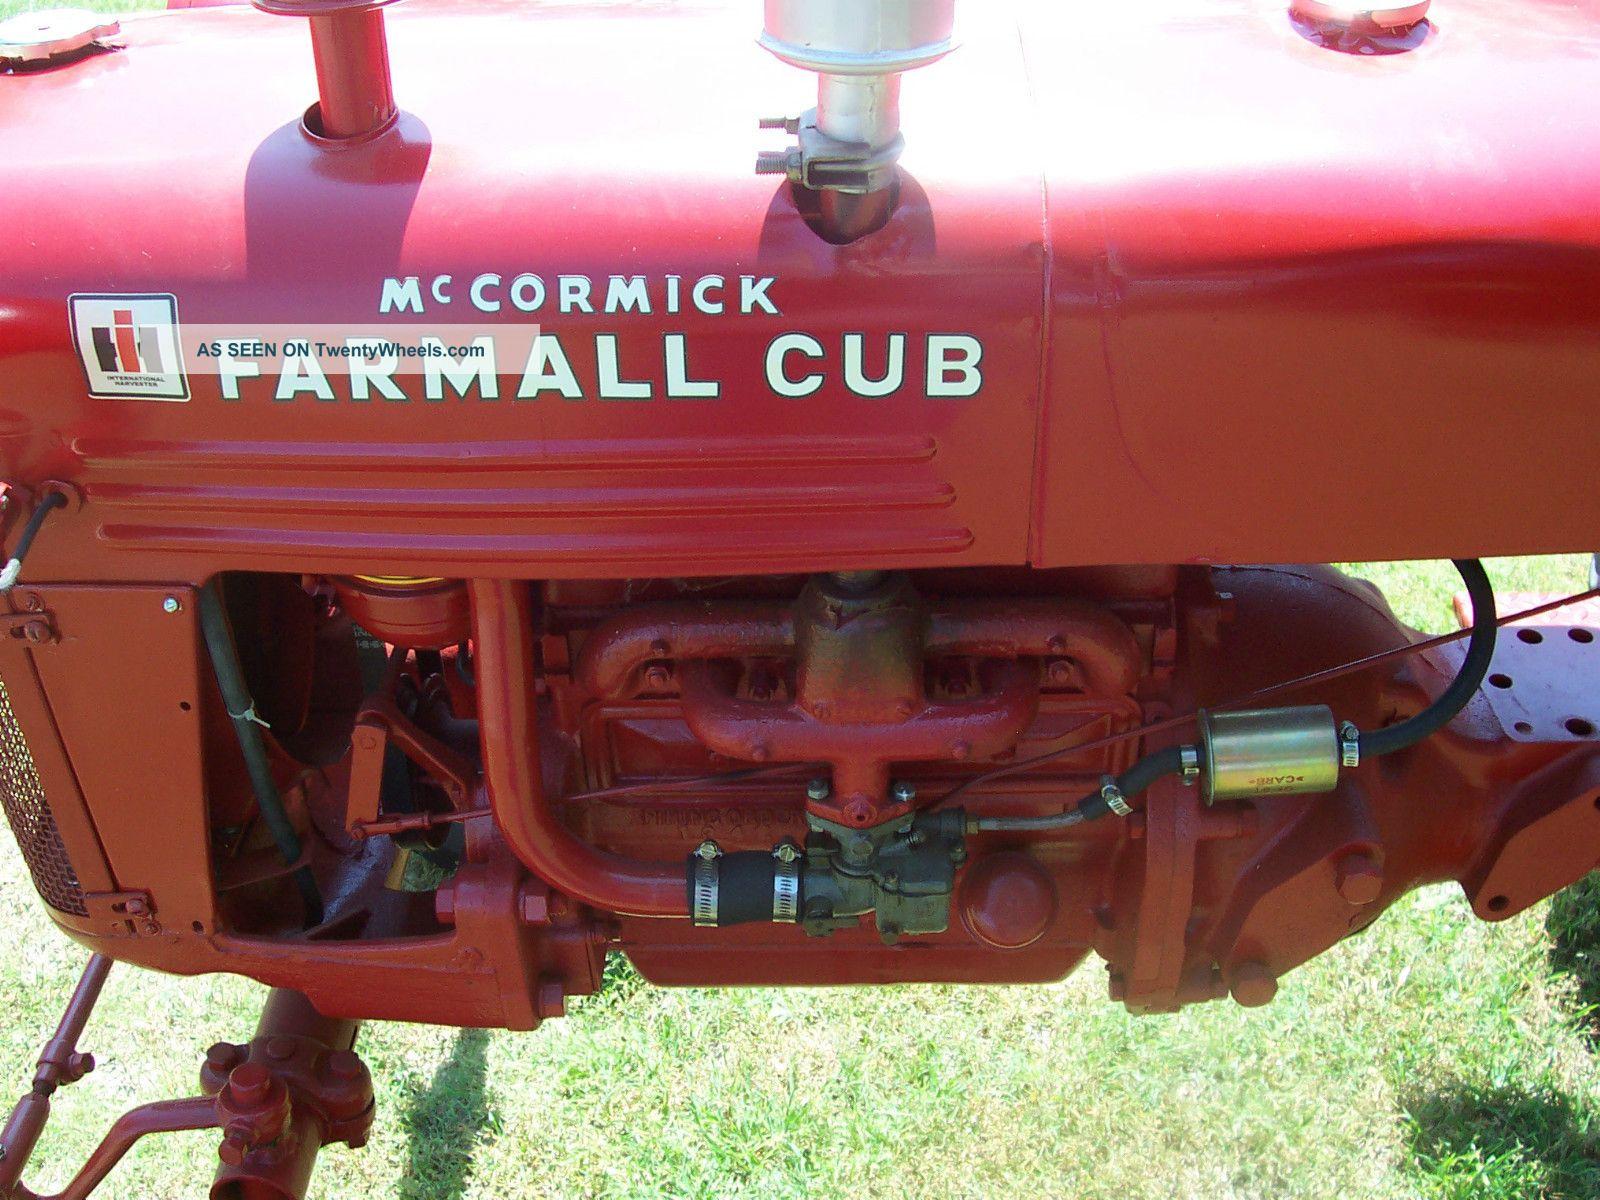 1948 allis chalmers b tractor tractor parts diagram images home 1948 allis chalmers b tractor tractor parts diagram images well honda gx390 wiring diagram likewise farmall